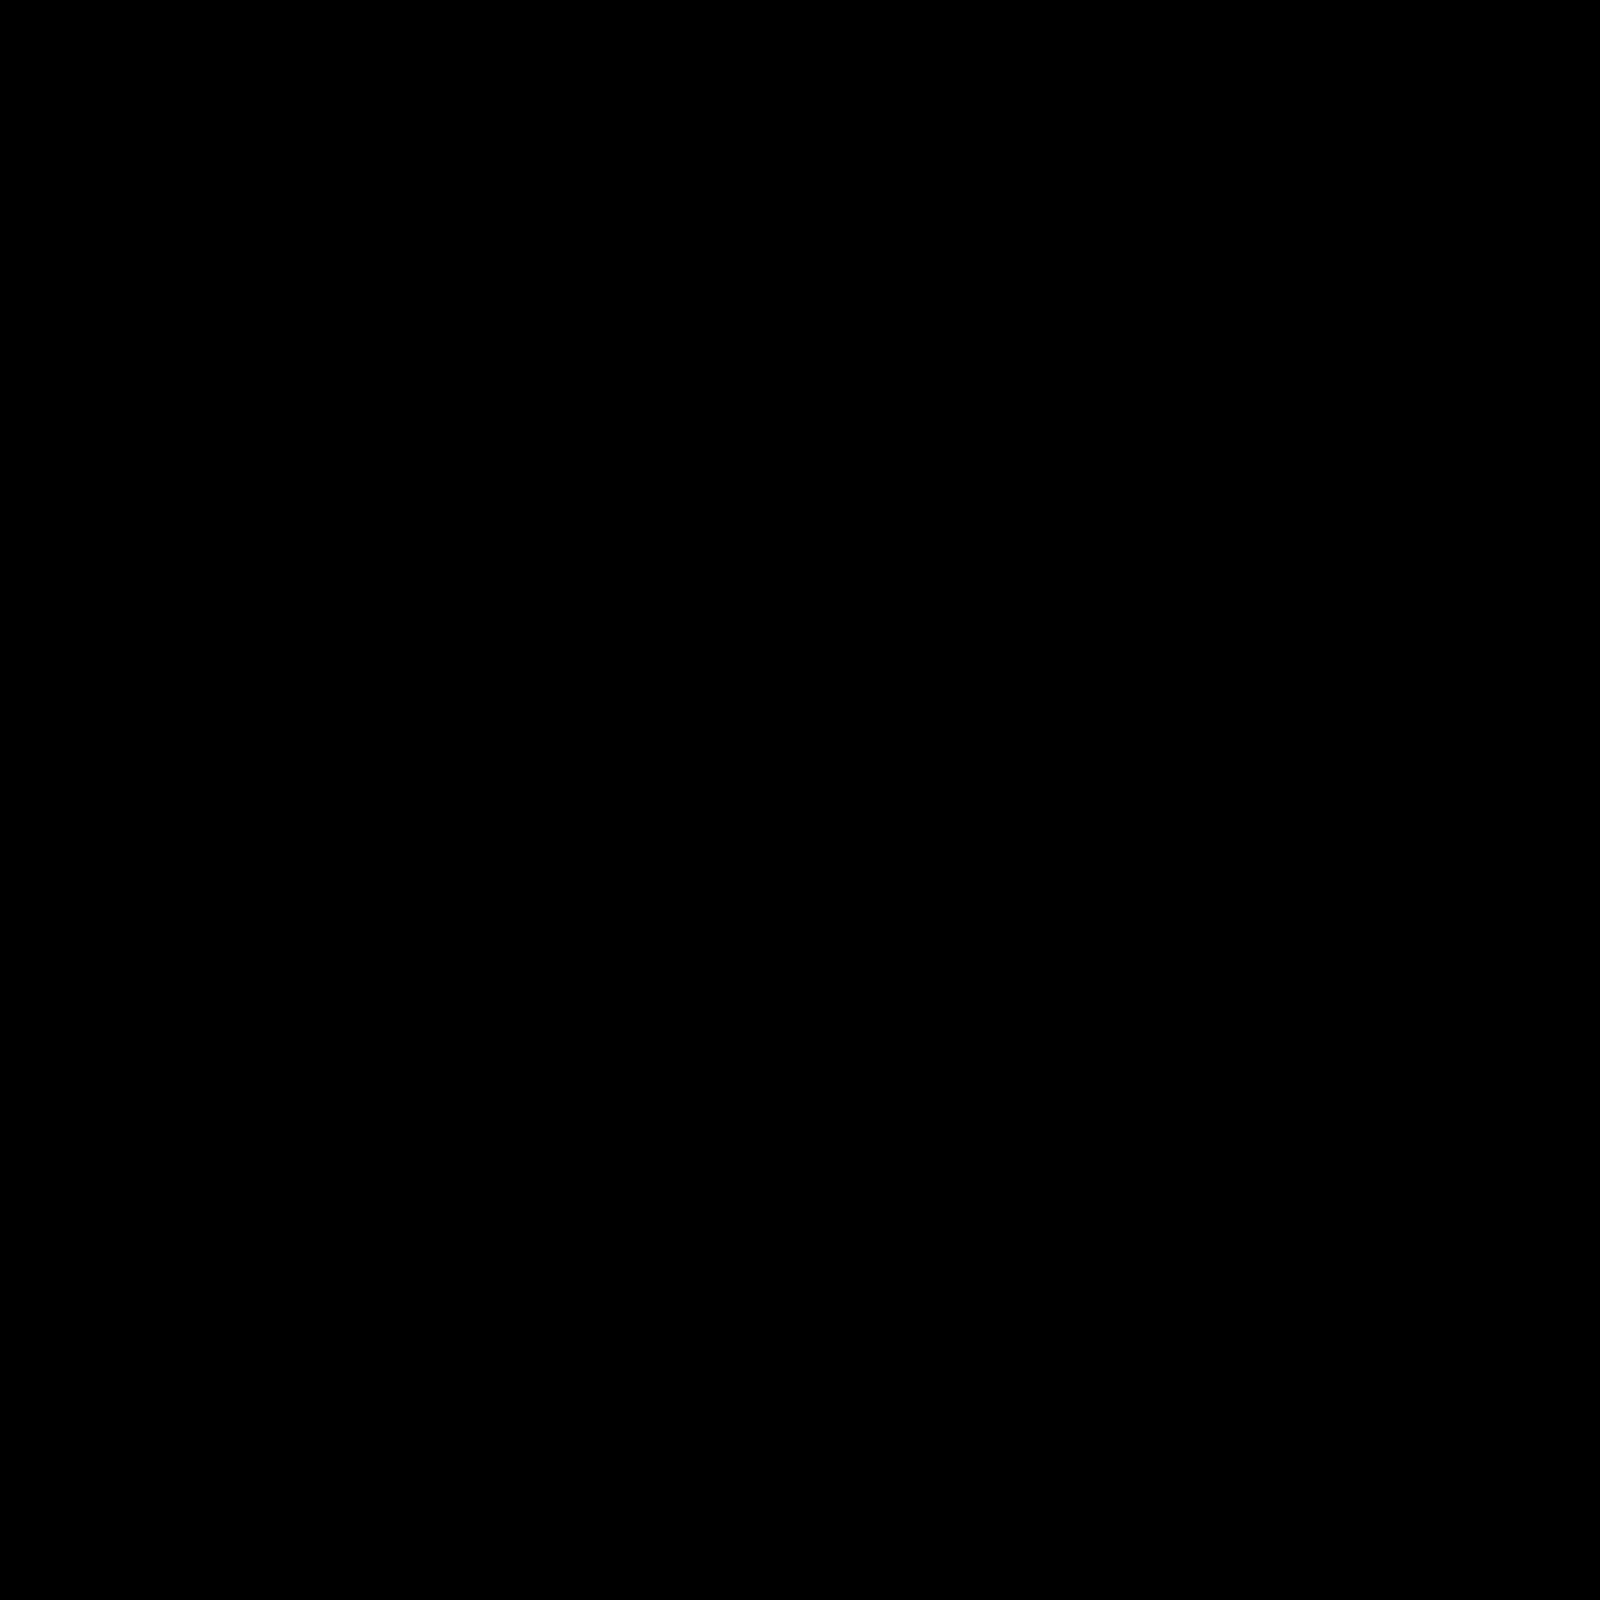 JavaScript Filled icon